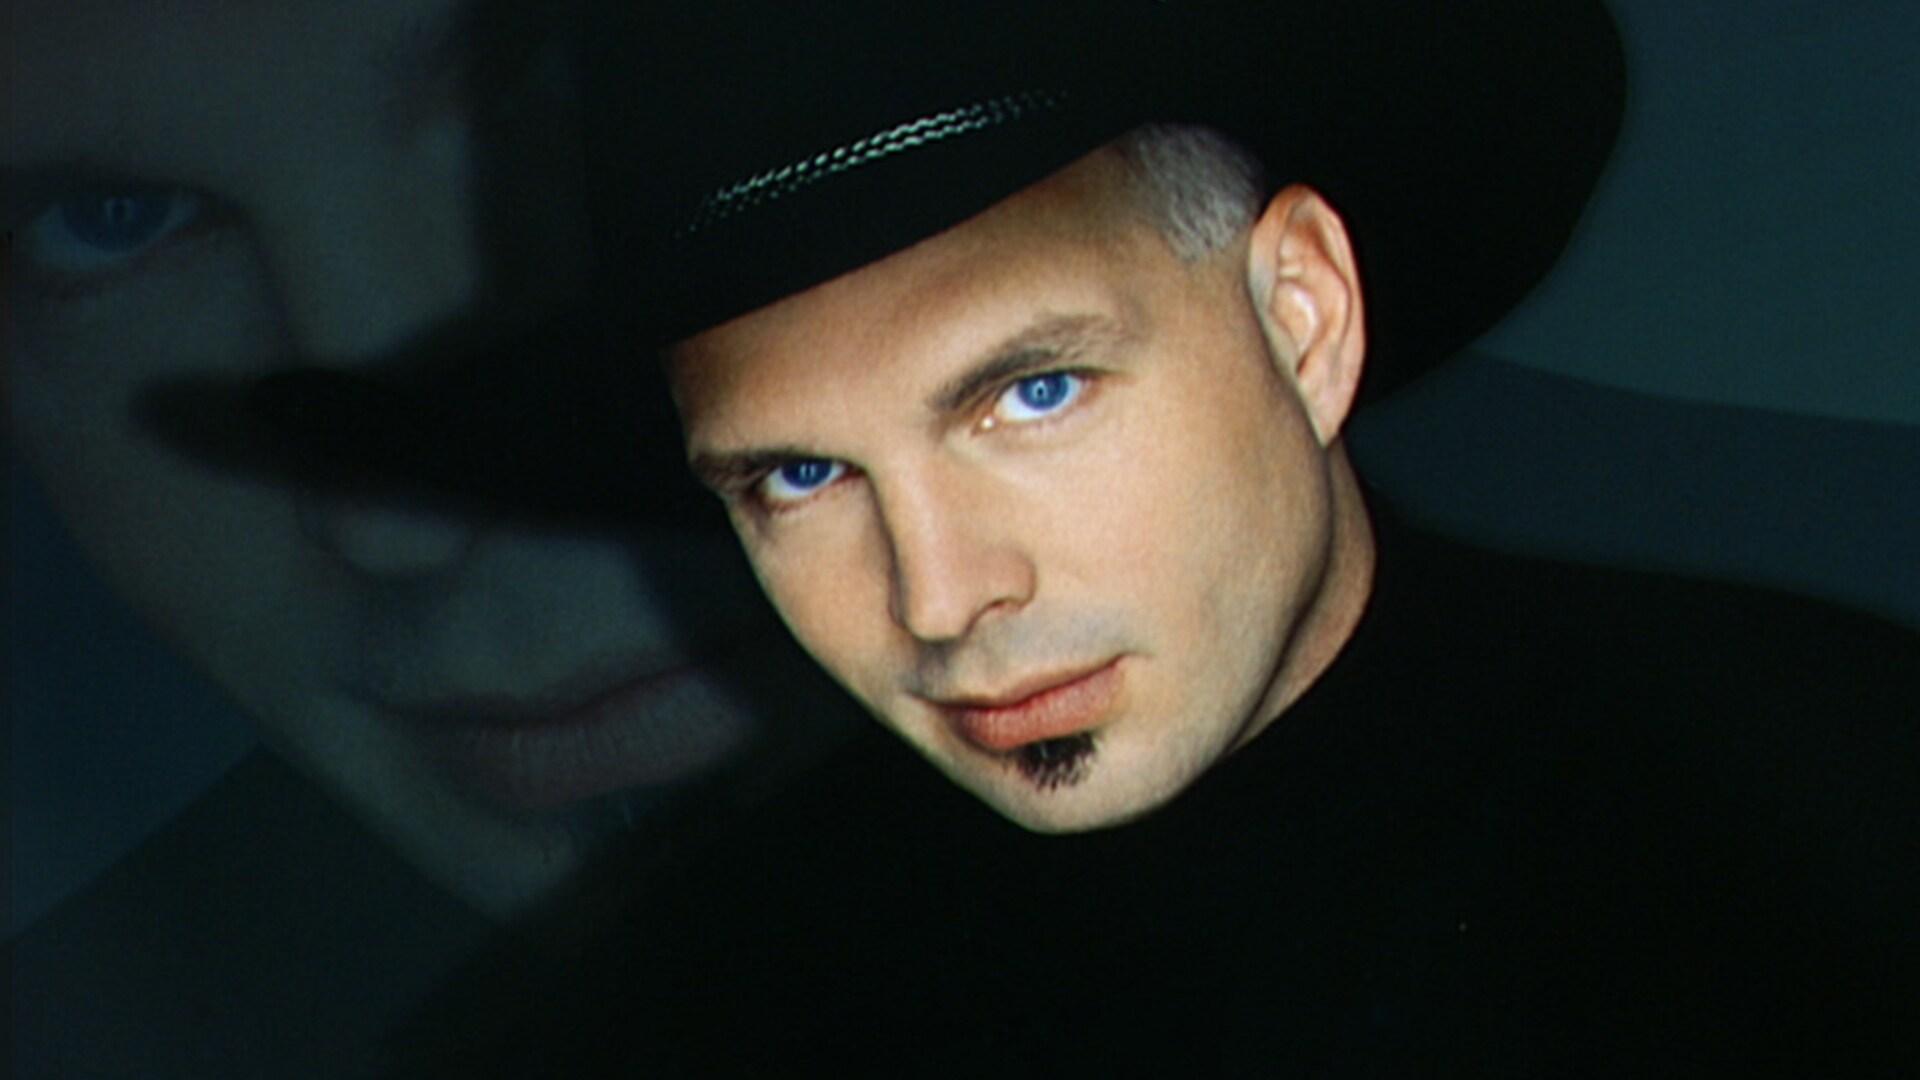 Garth Brooks: November 13, 1999